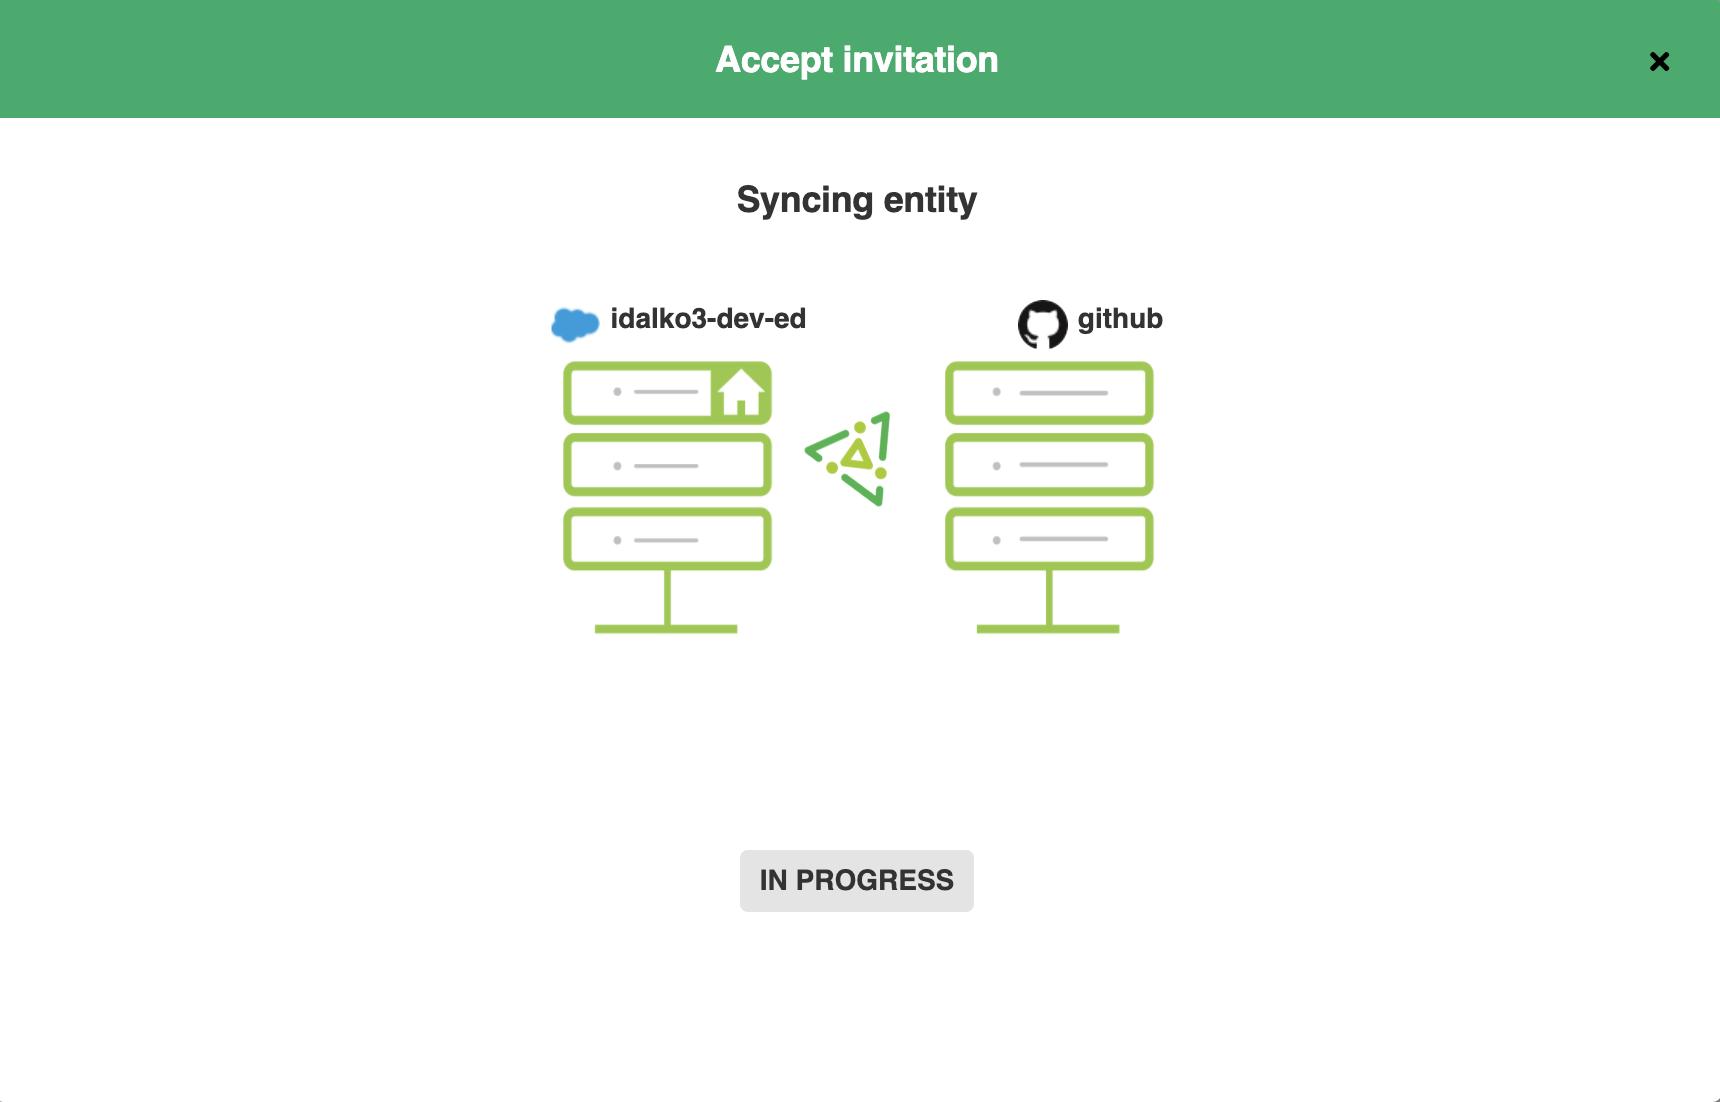 GitHub salesforce integration in progress